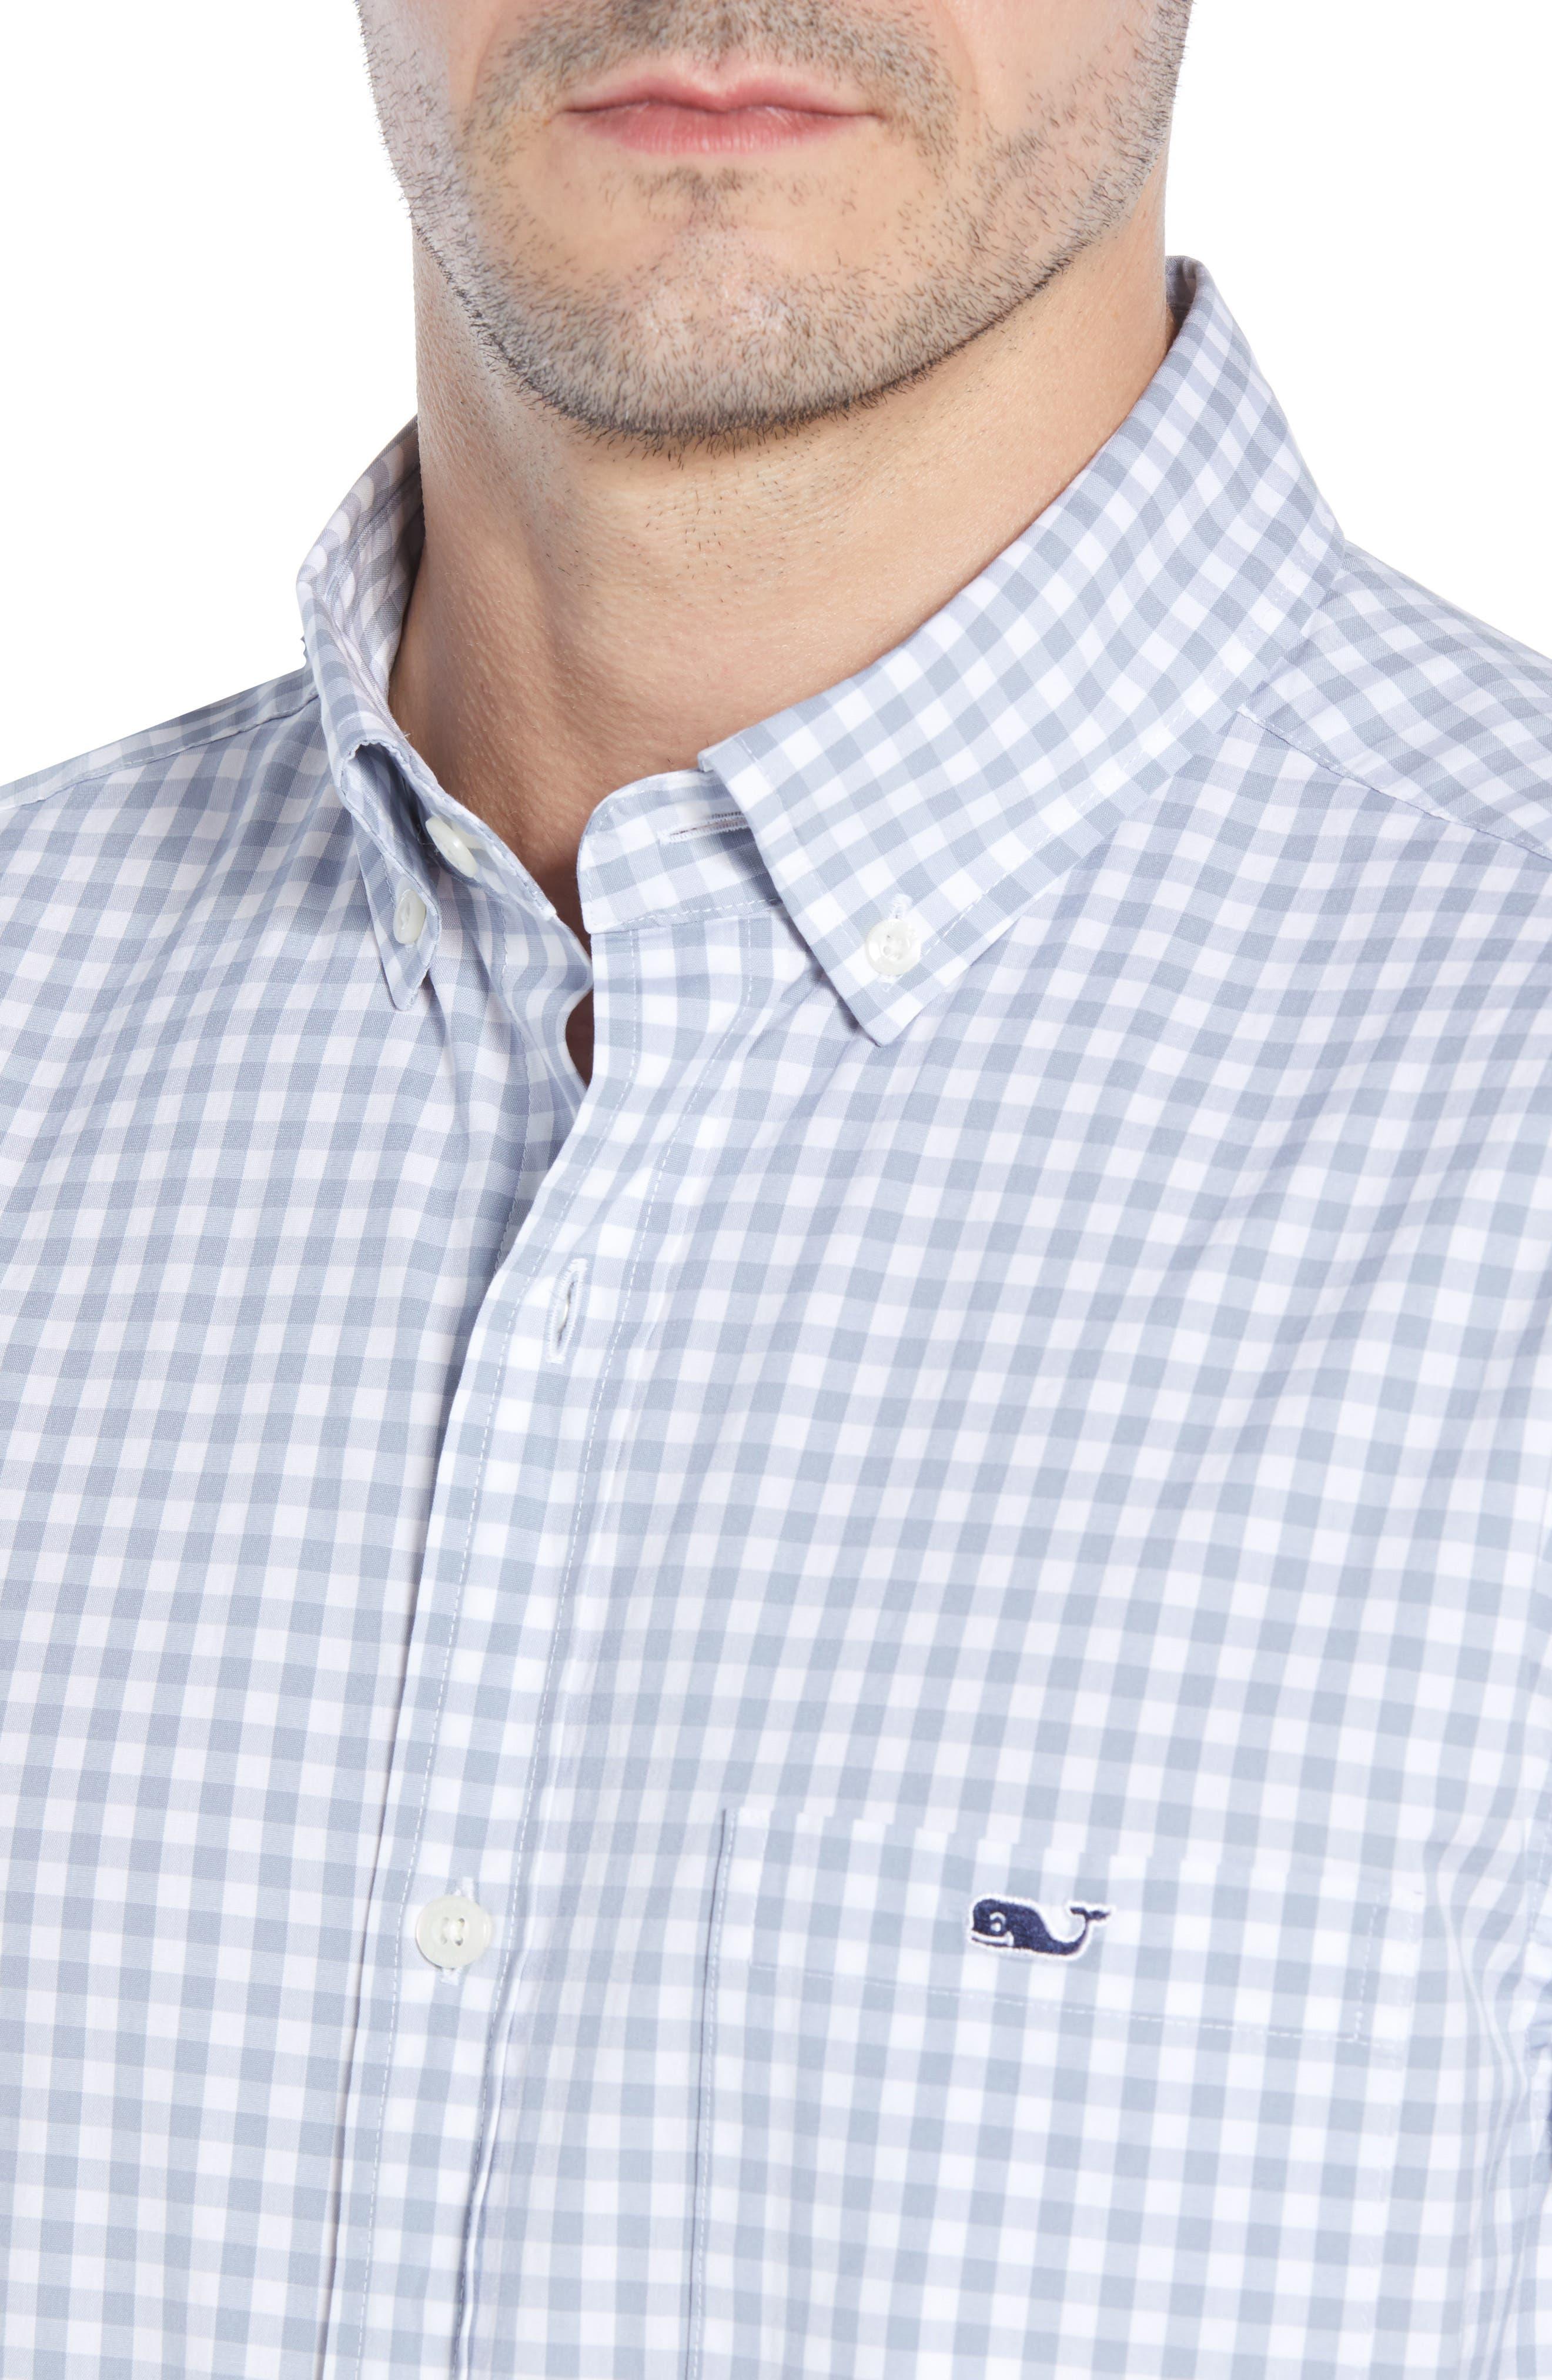 VINEYARD VINES, Carleton Classic Fit Gingham Buttondown Shirt, Alternate thumbnail 2, color, 023